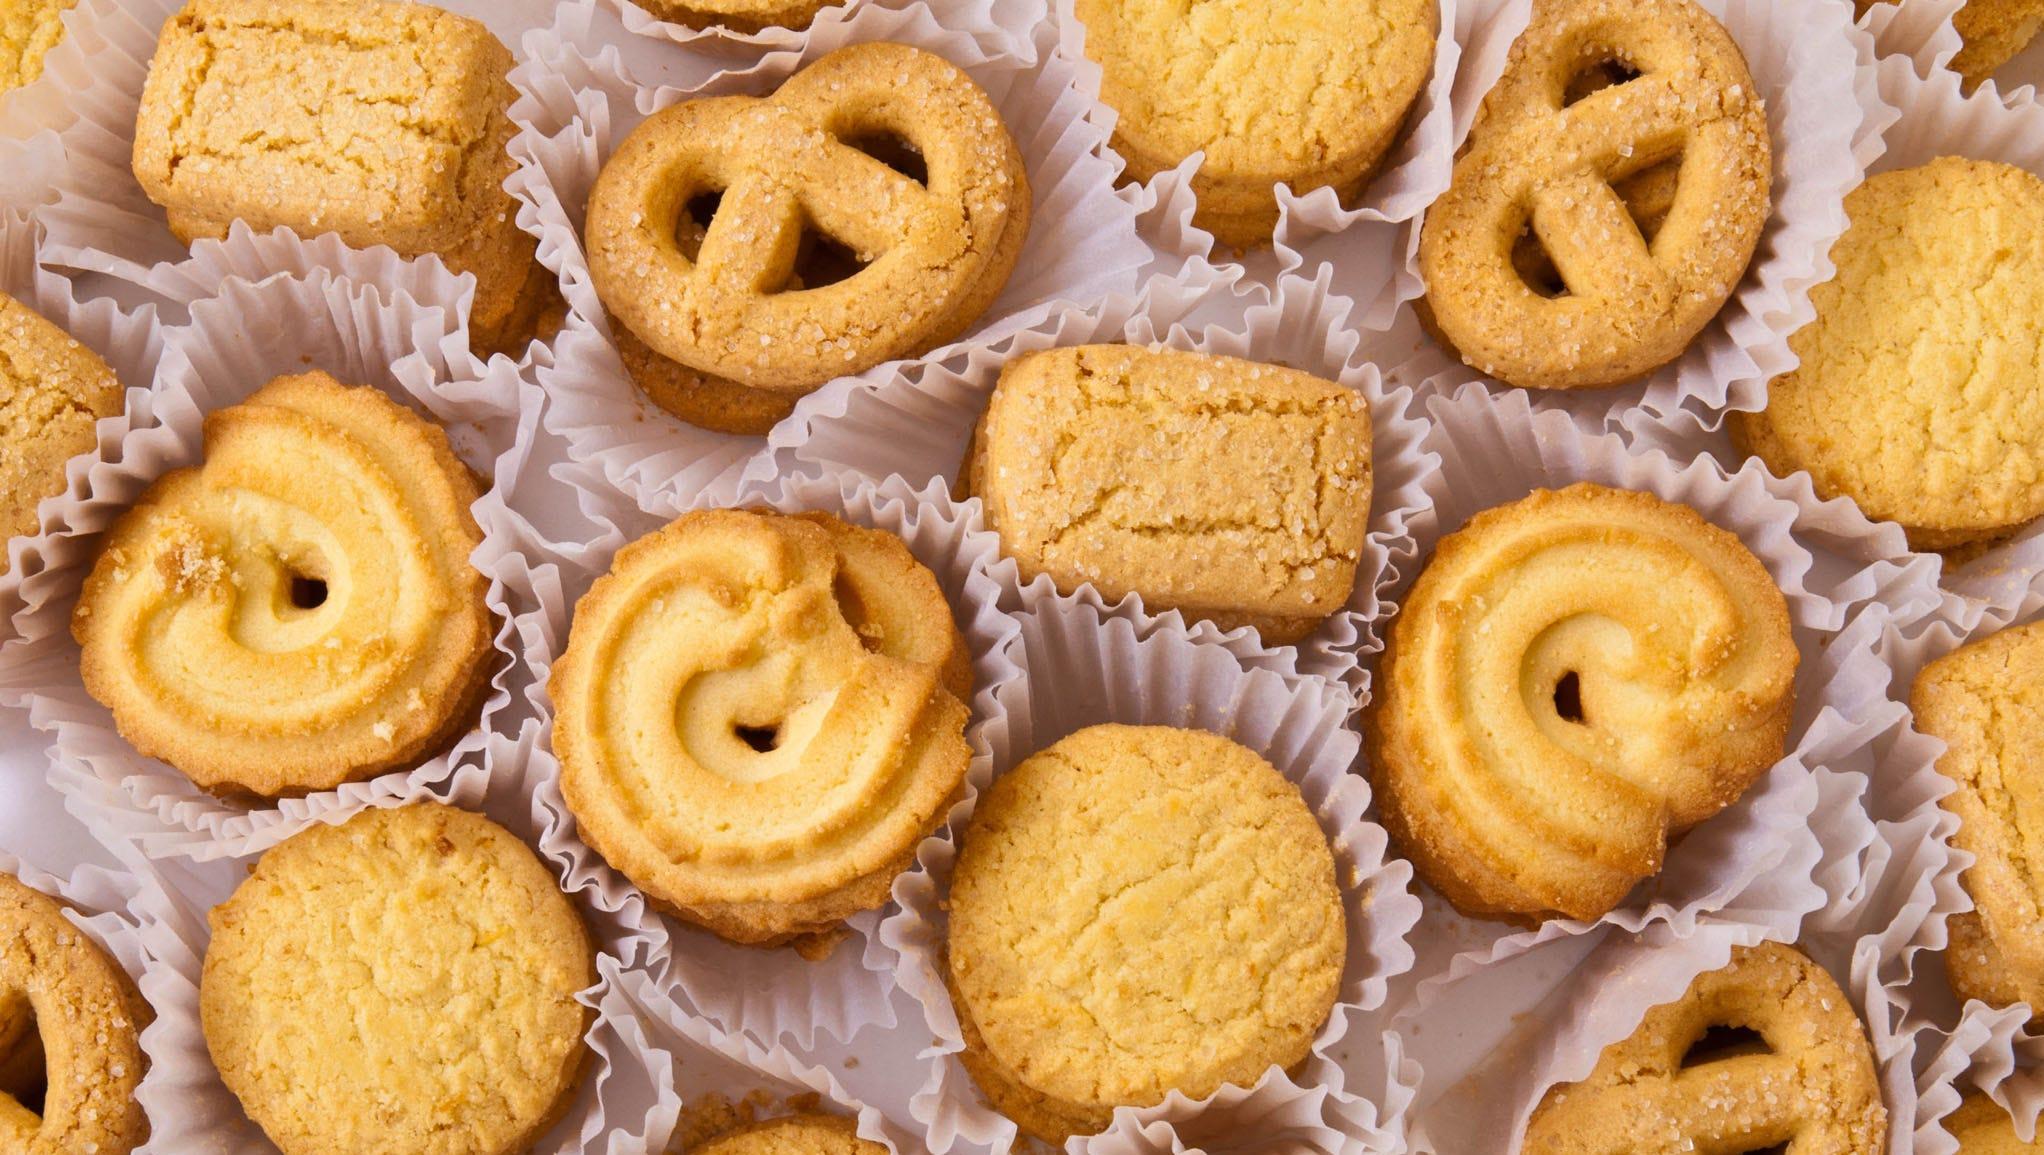 Cuckoo For Cookies 19 Tasty Treats Around The World